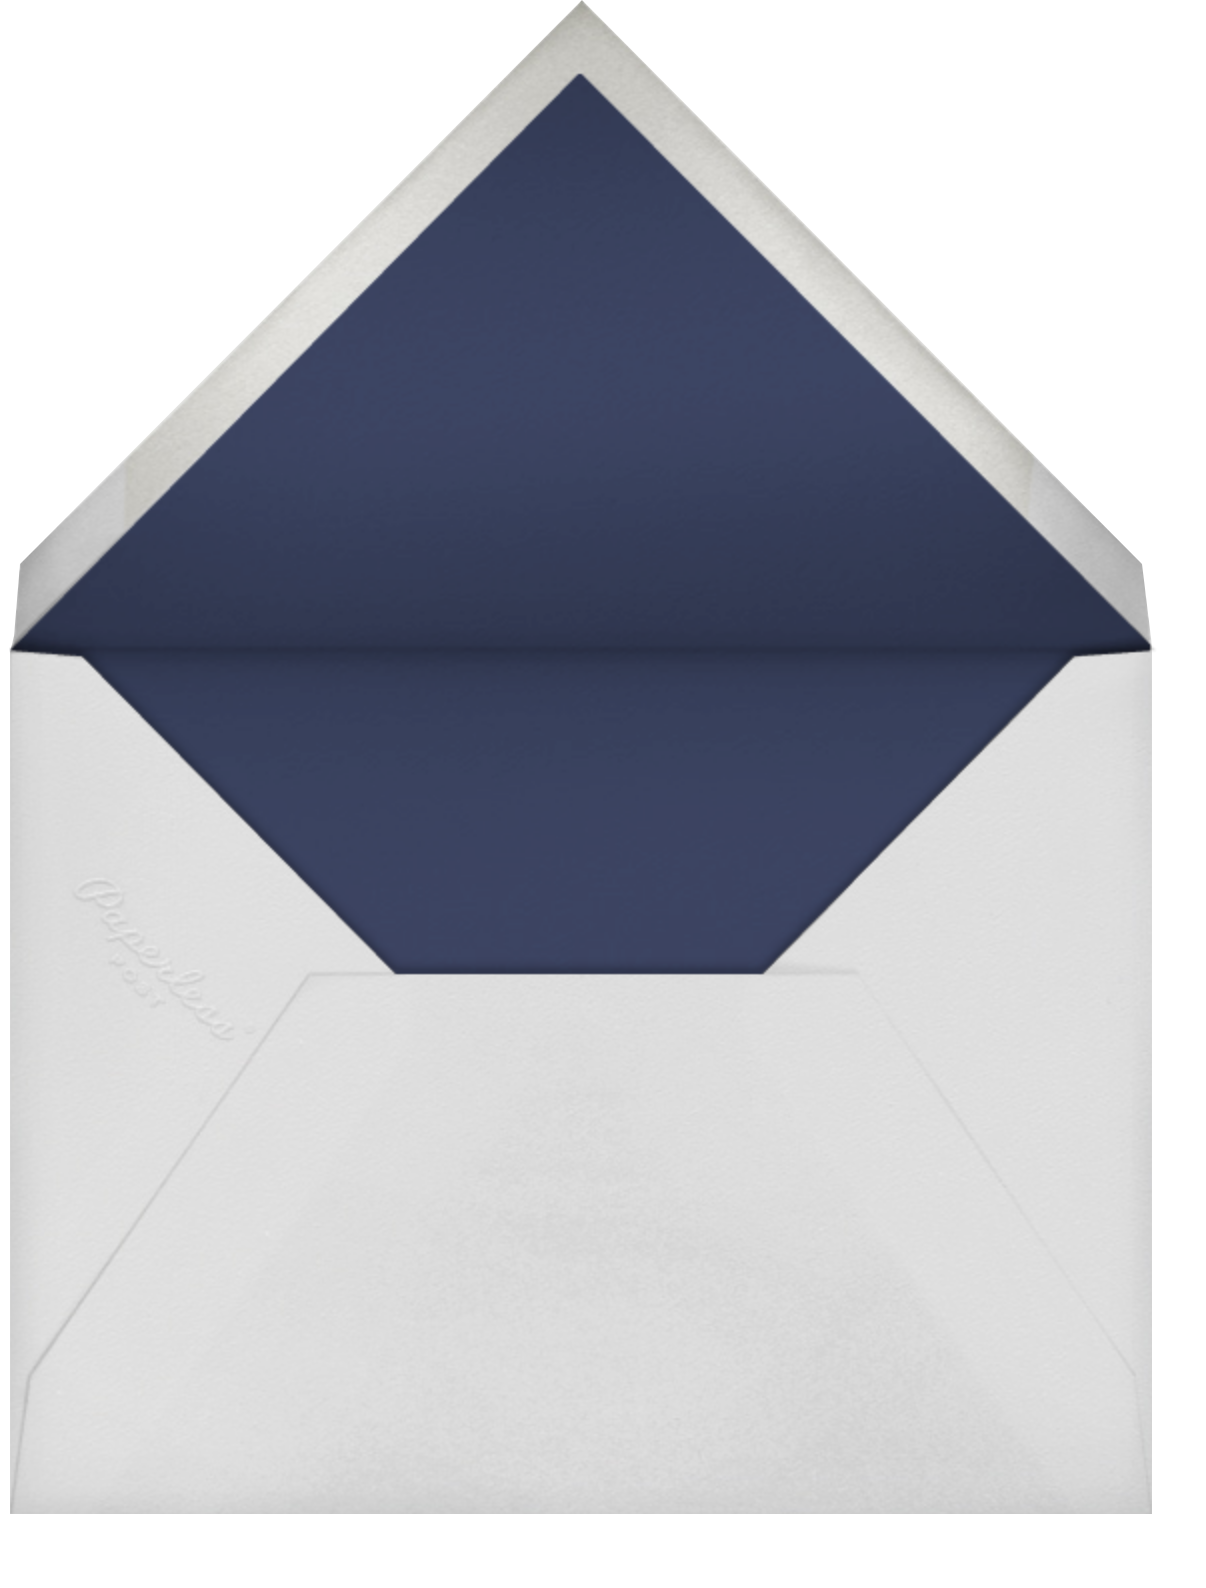 Lighted Night - Paperless Post - Envelope